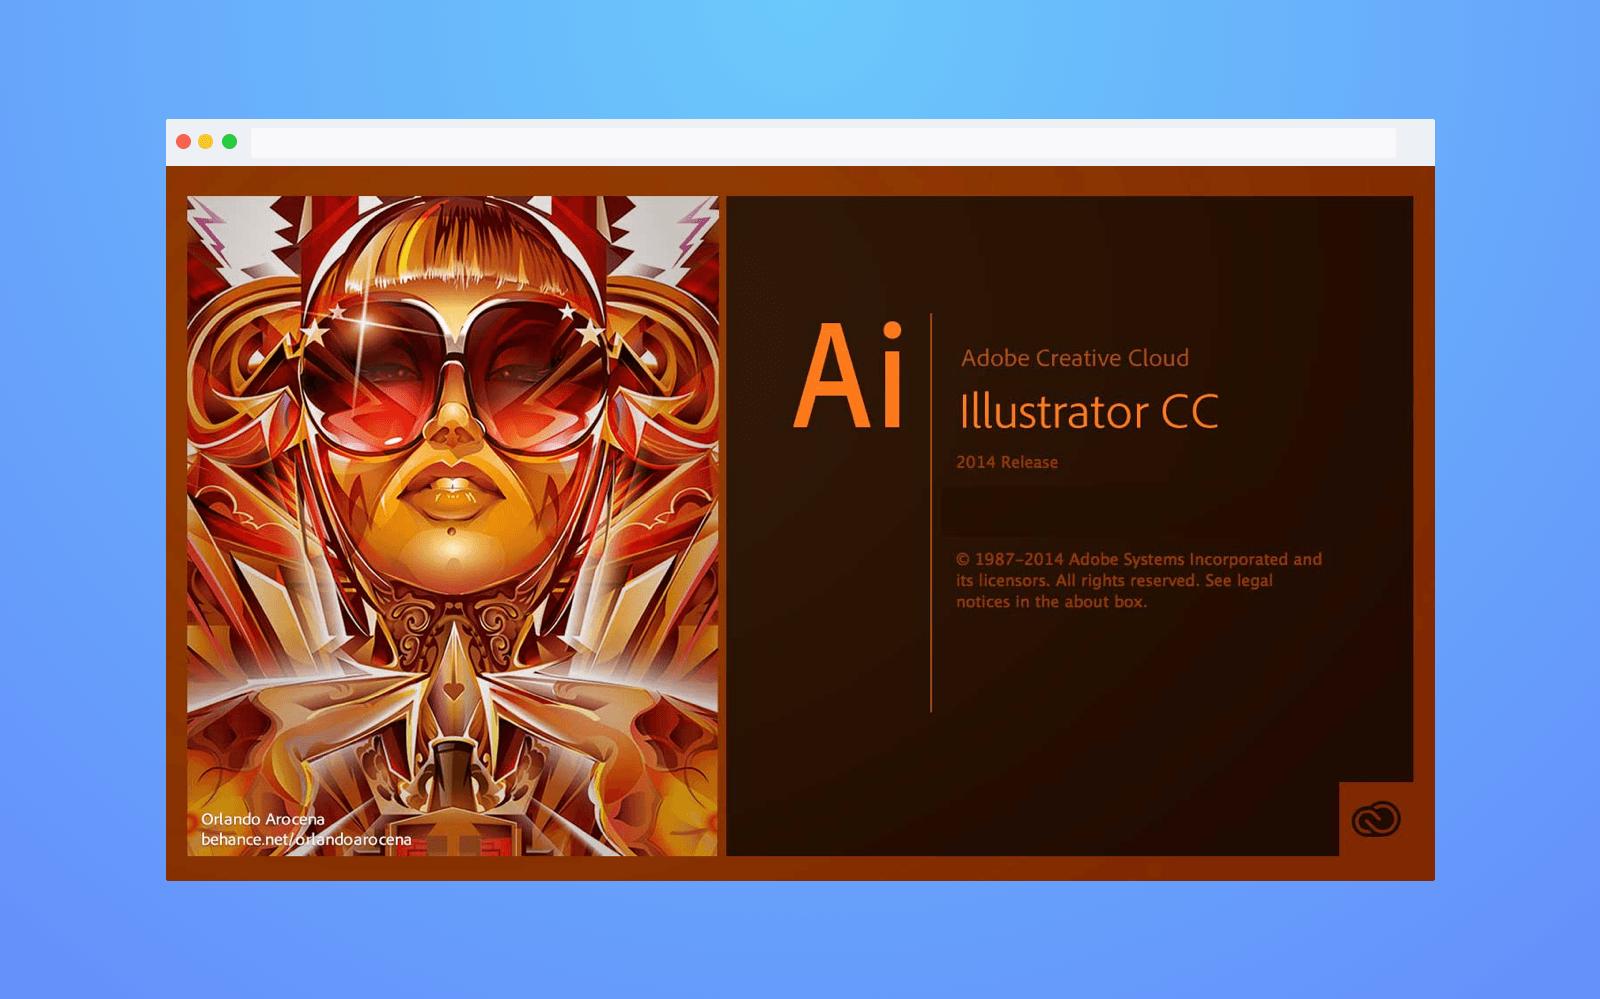 Adobe splash screen